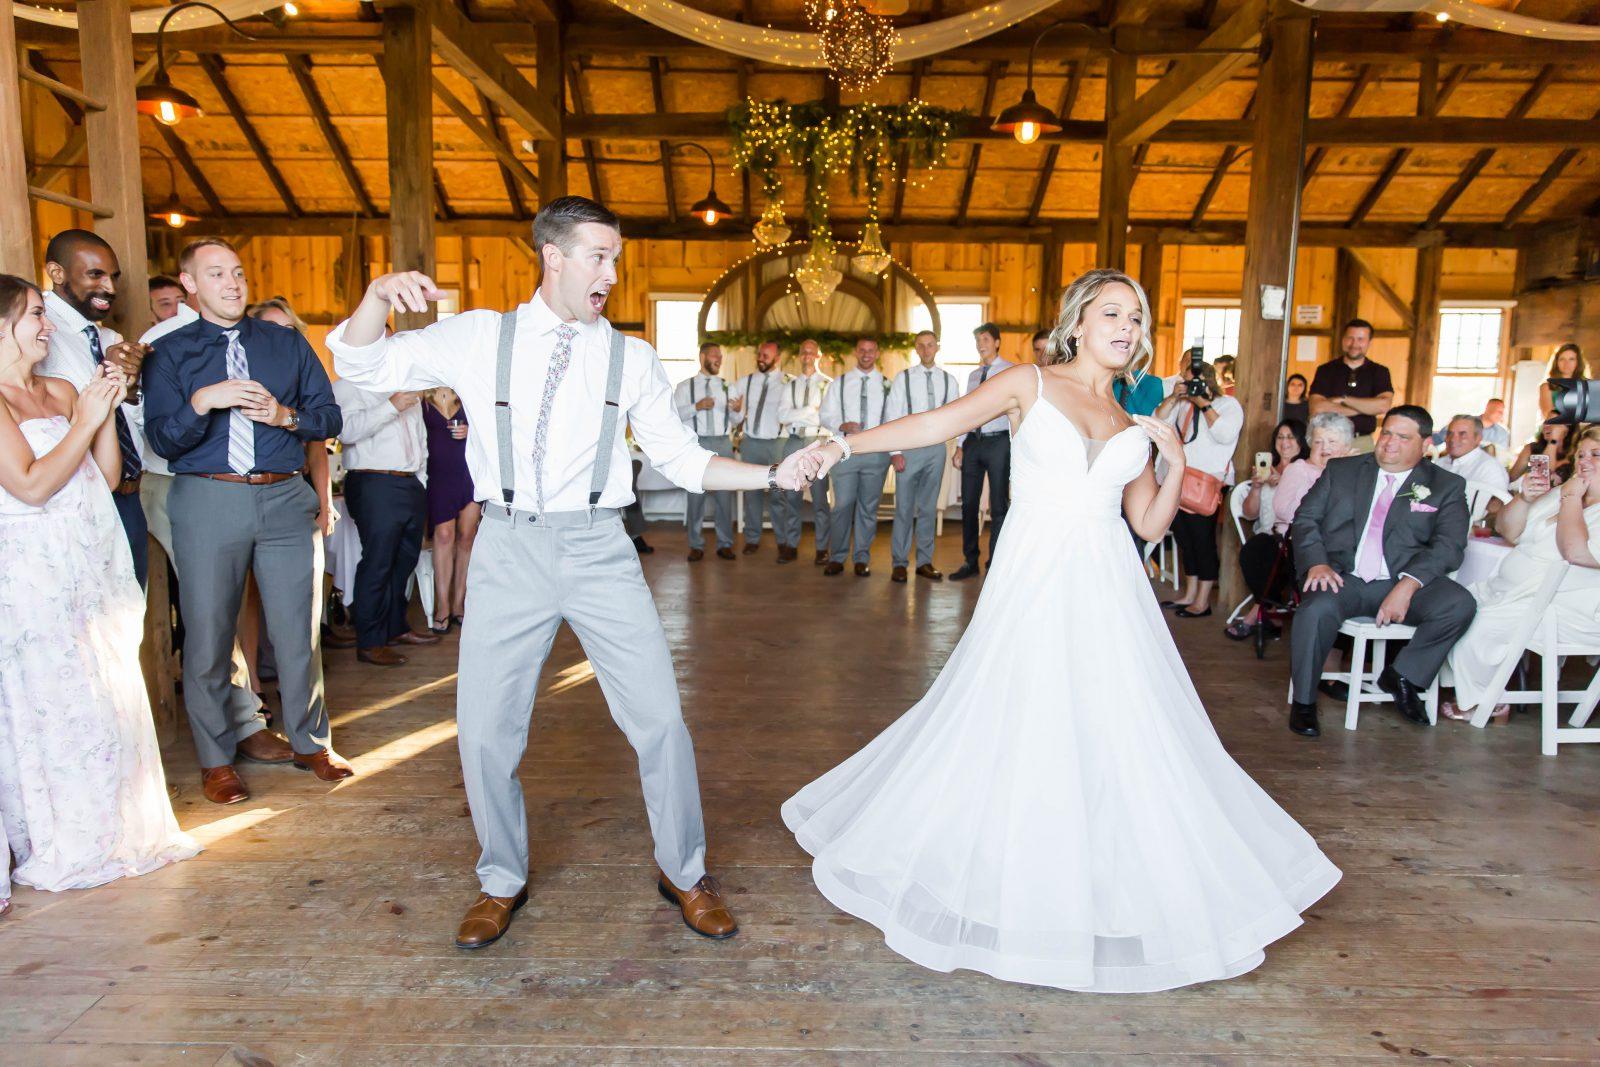 peacock-ridge-summer-wedding-photographer-akron-ohio-loren-jackson-photography-95